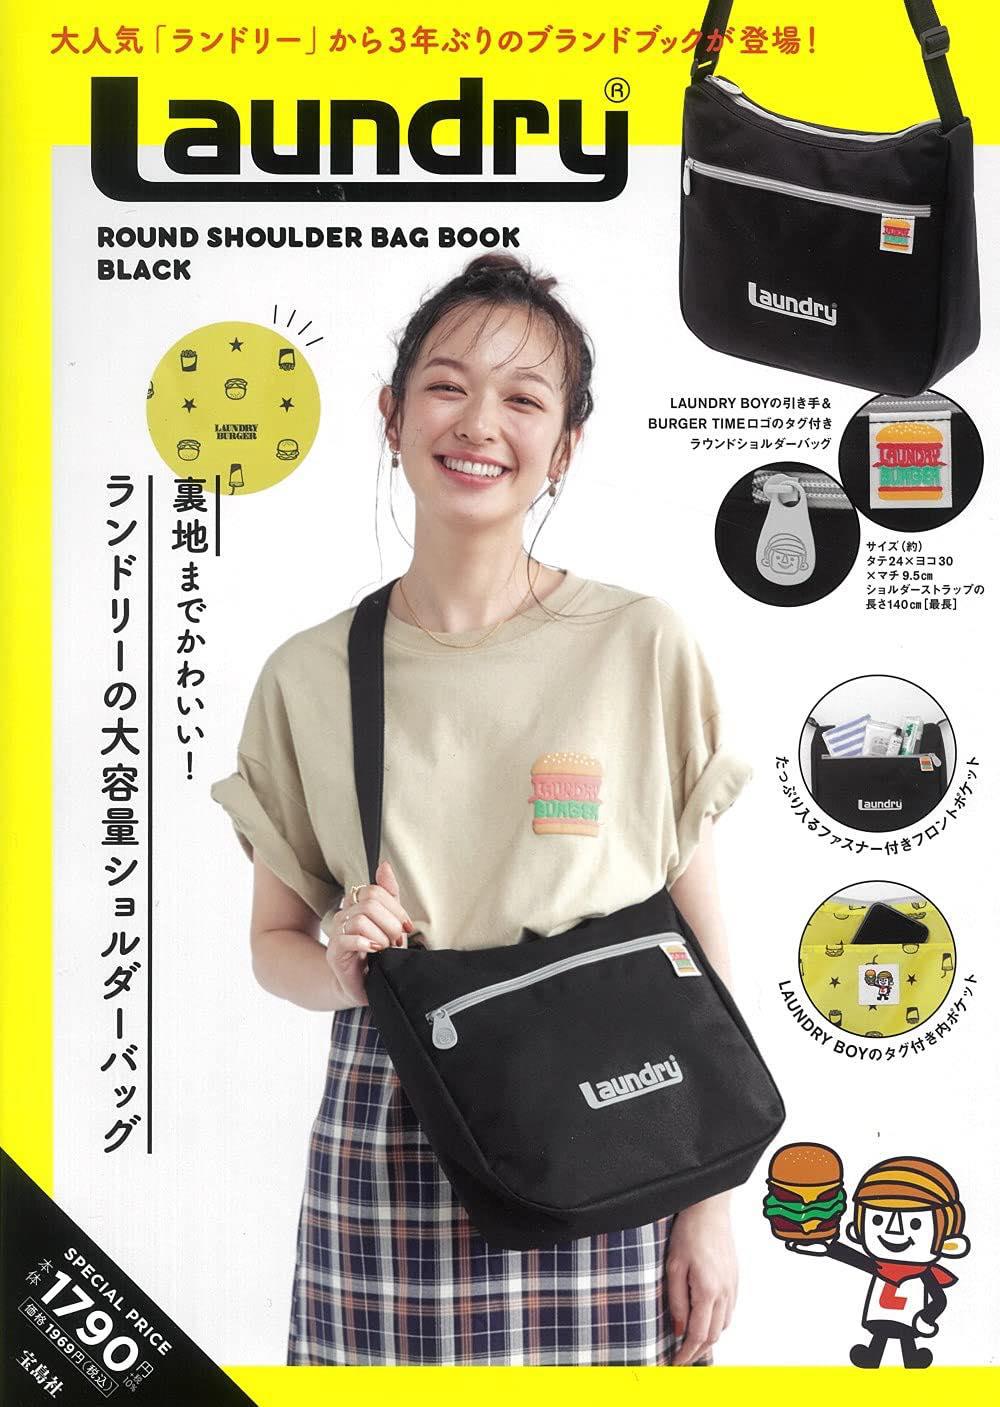 Laundry ROUND SHOULDER BAG BOOK